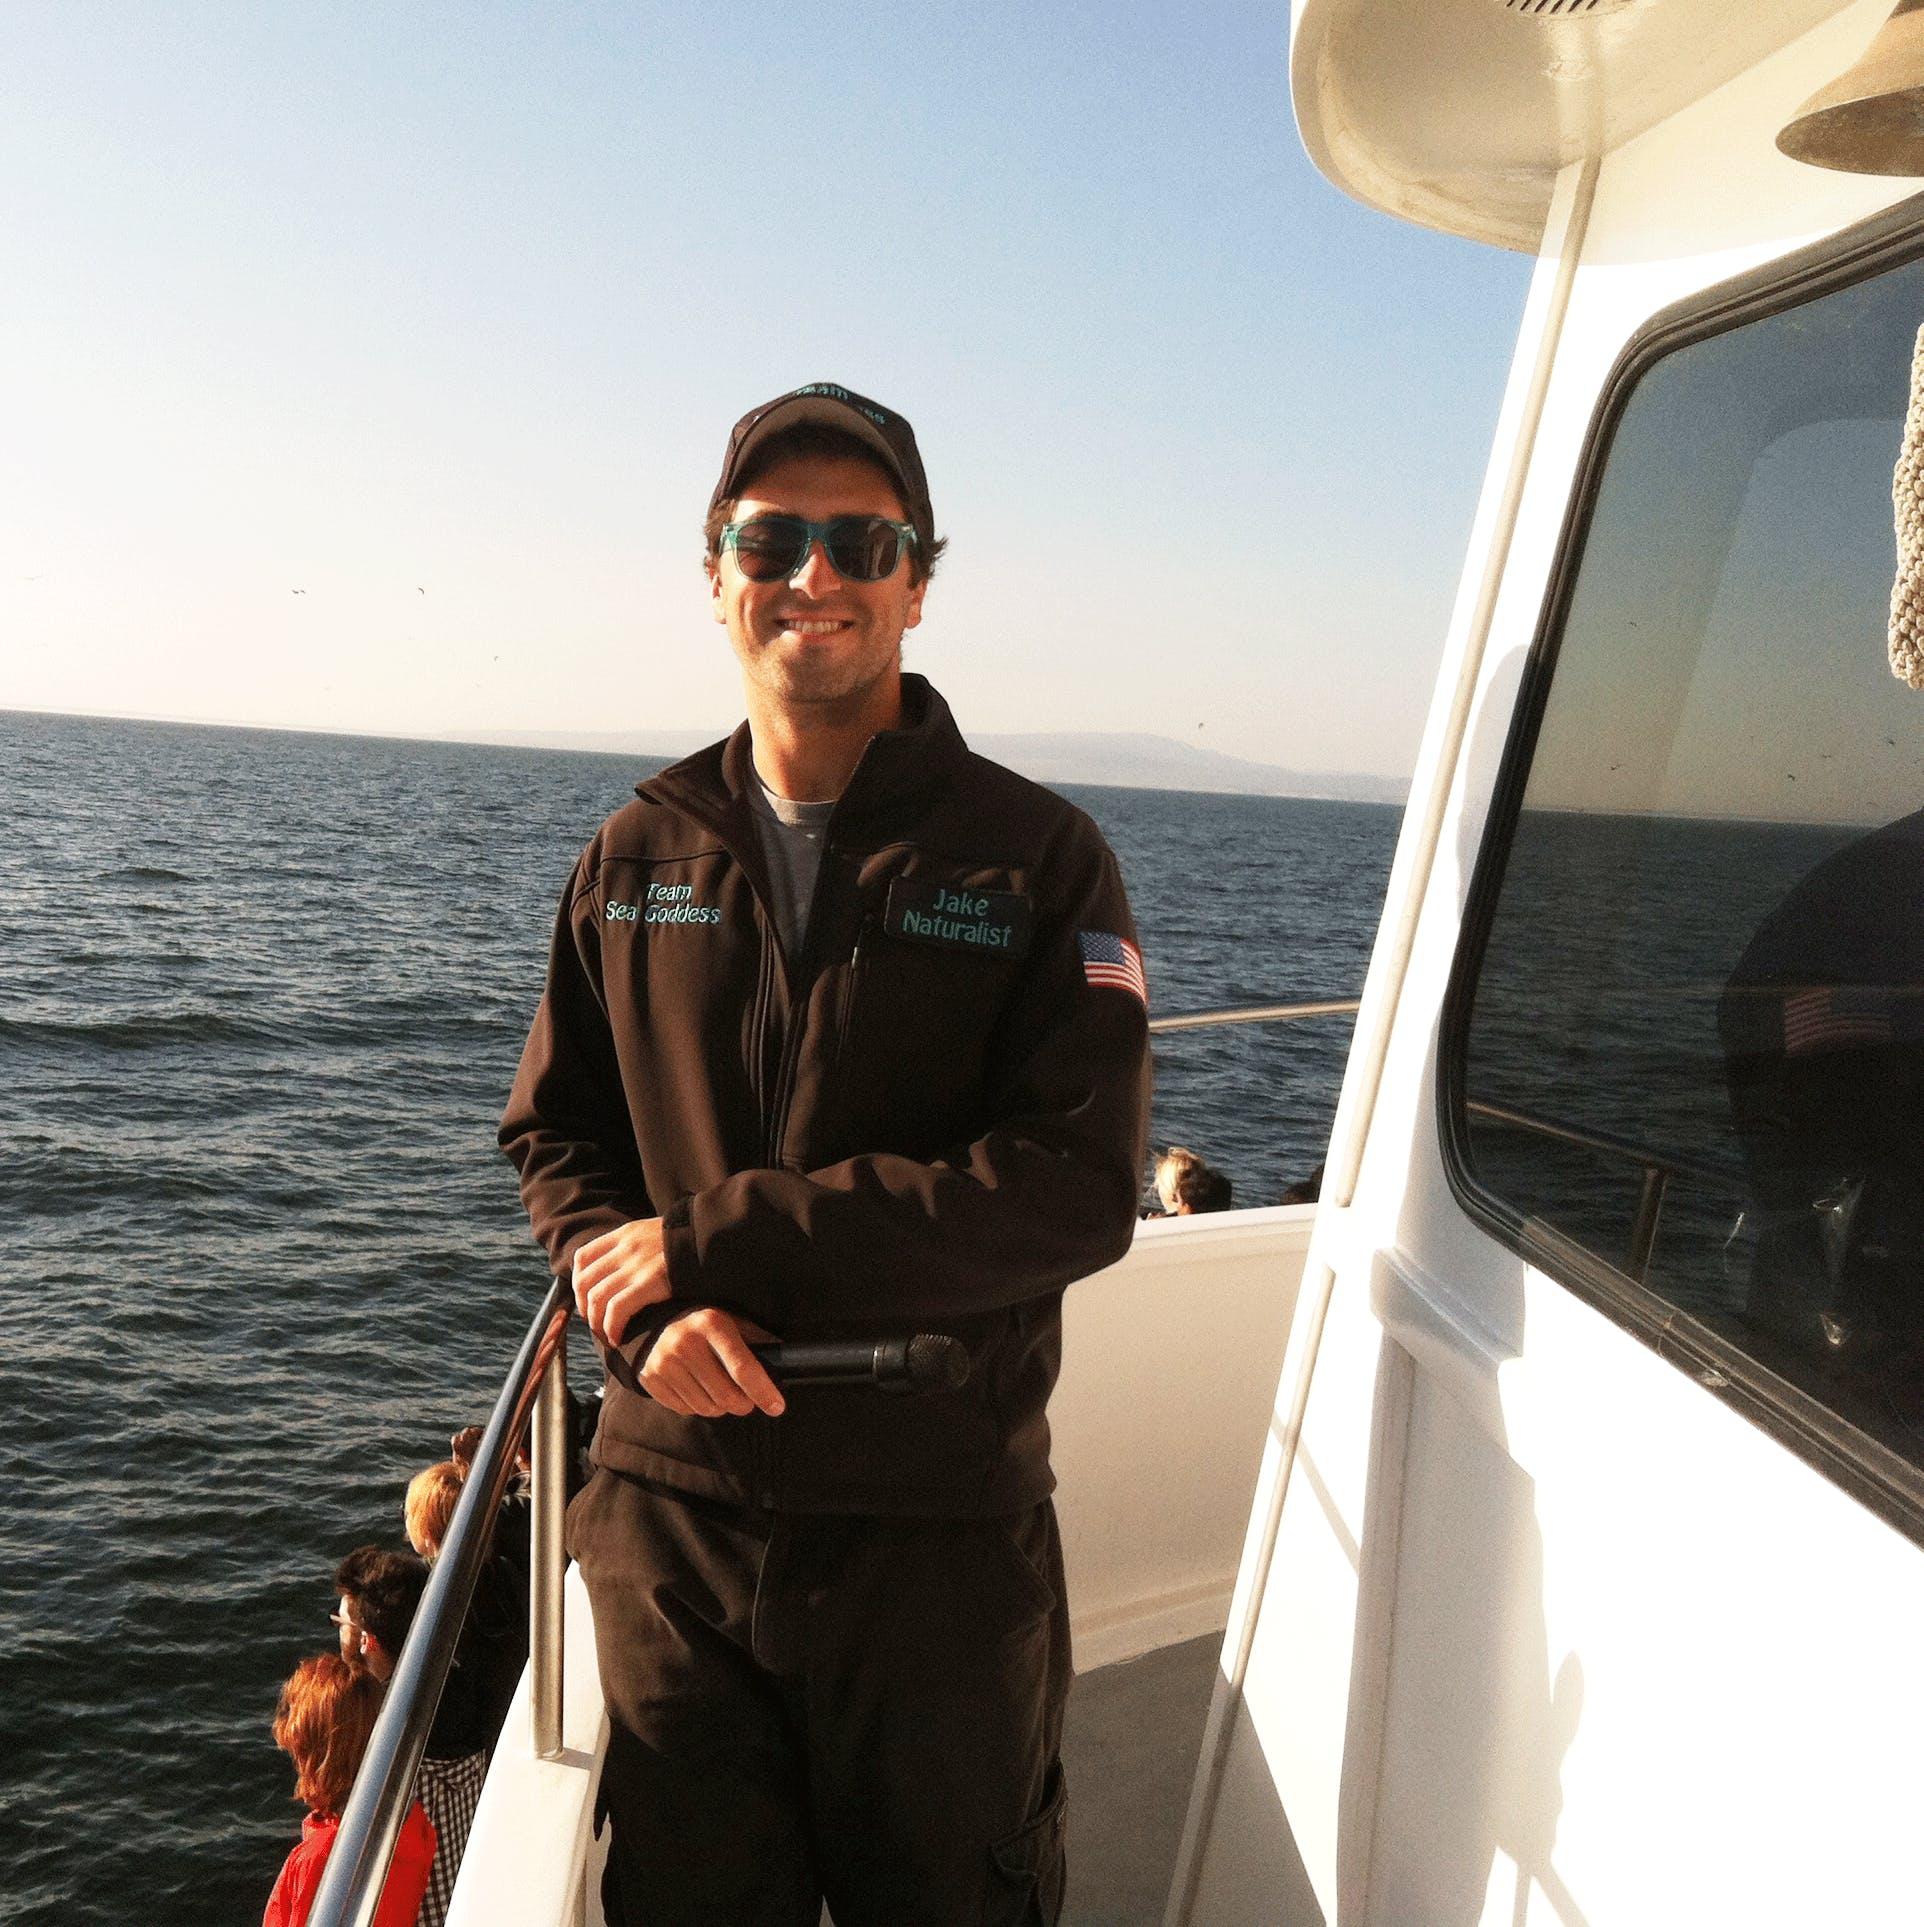 Jake Cline - Sea Goddess Whale Watching